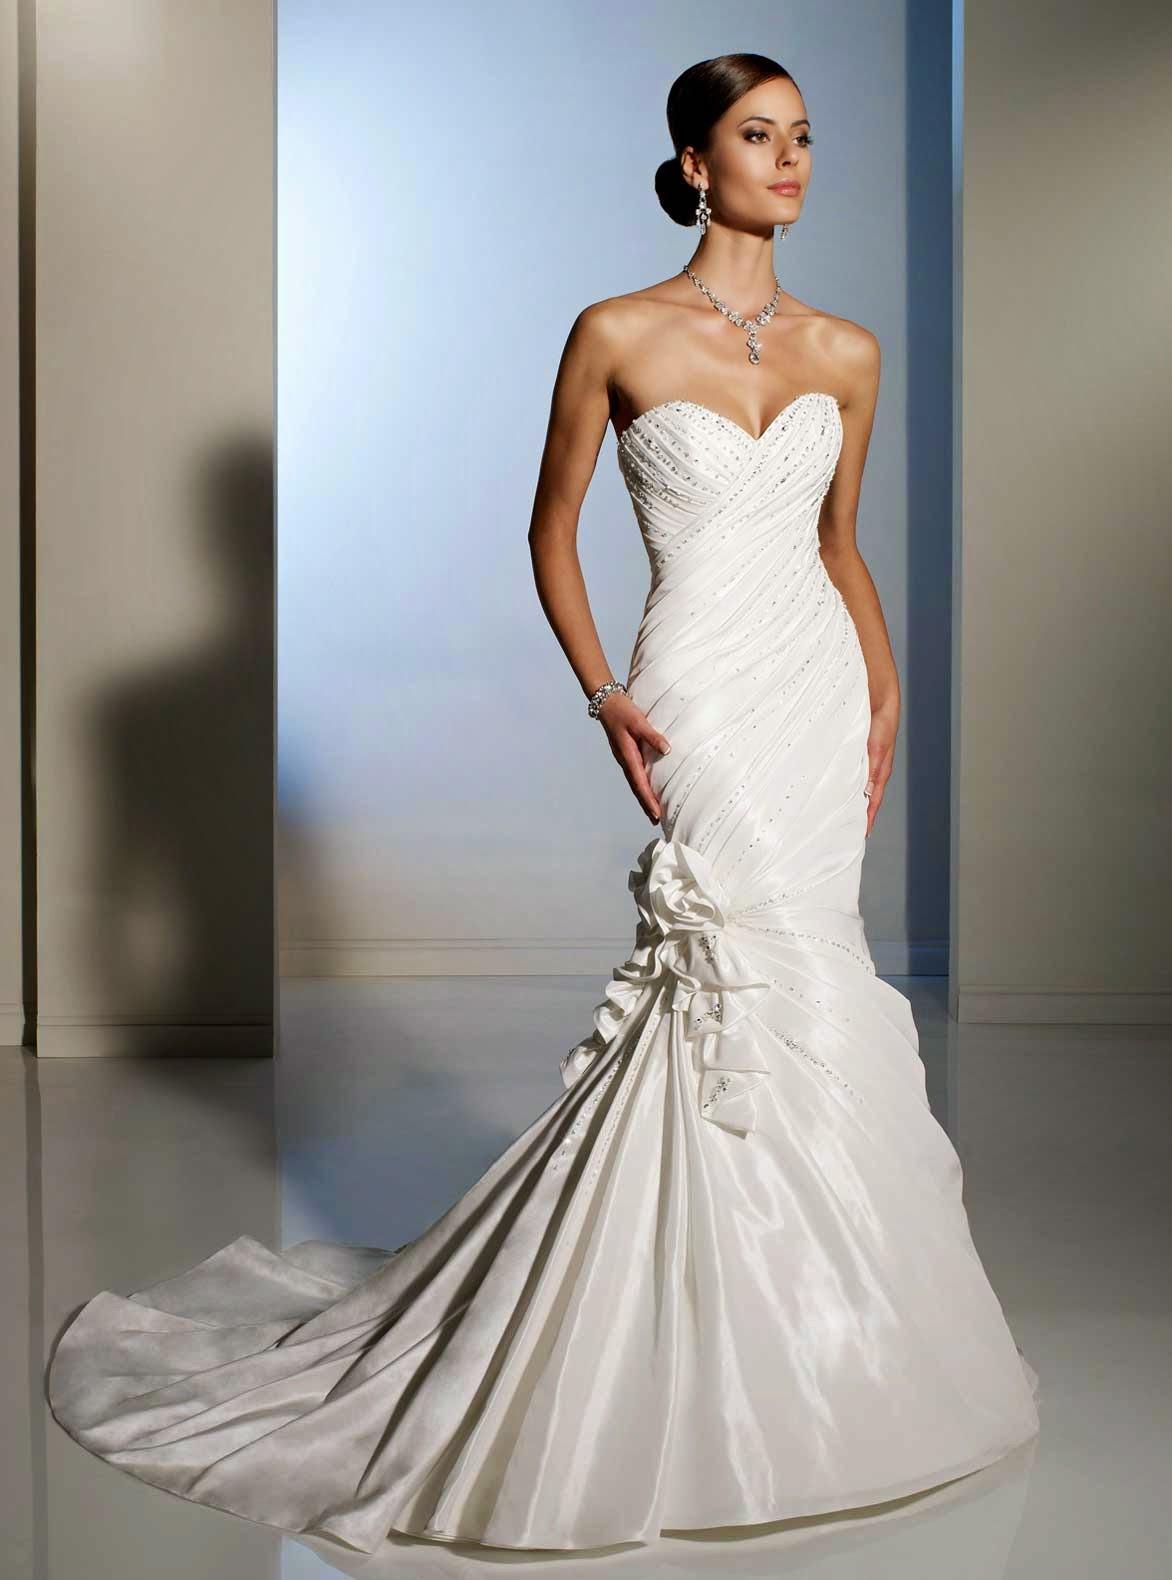 Designer Wedding Dresses 2014 Ideas Photos HD